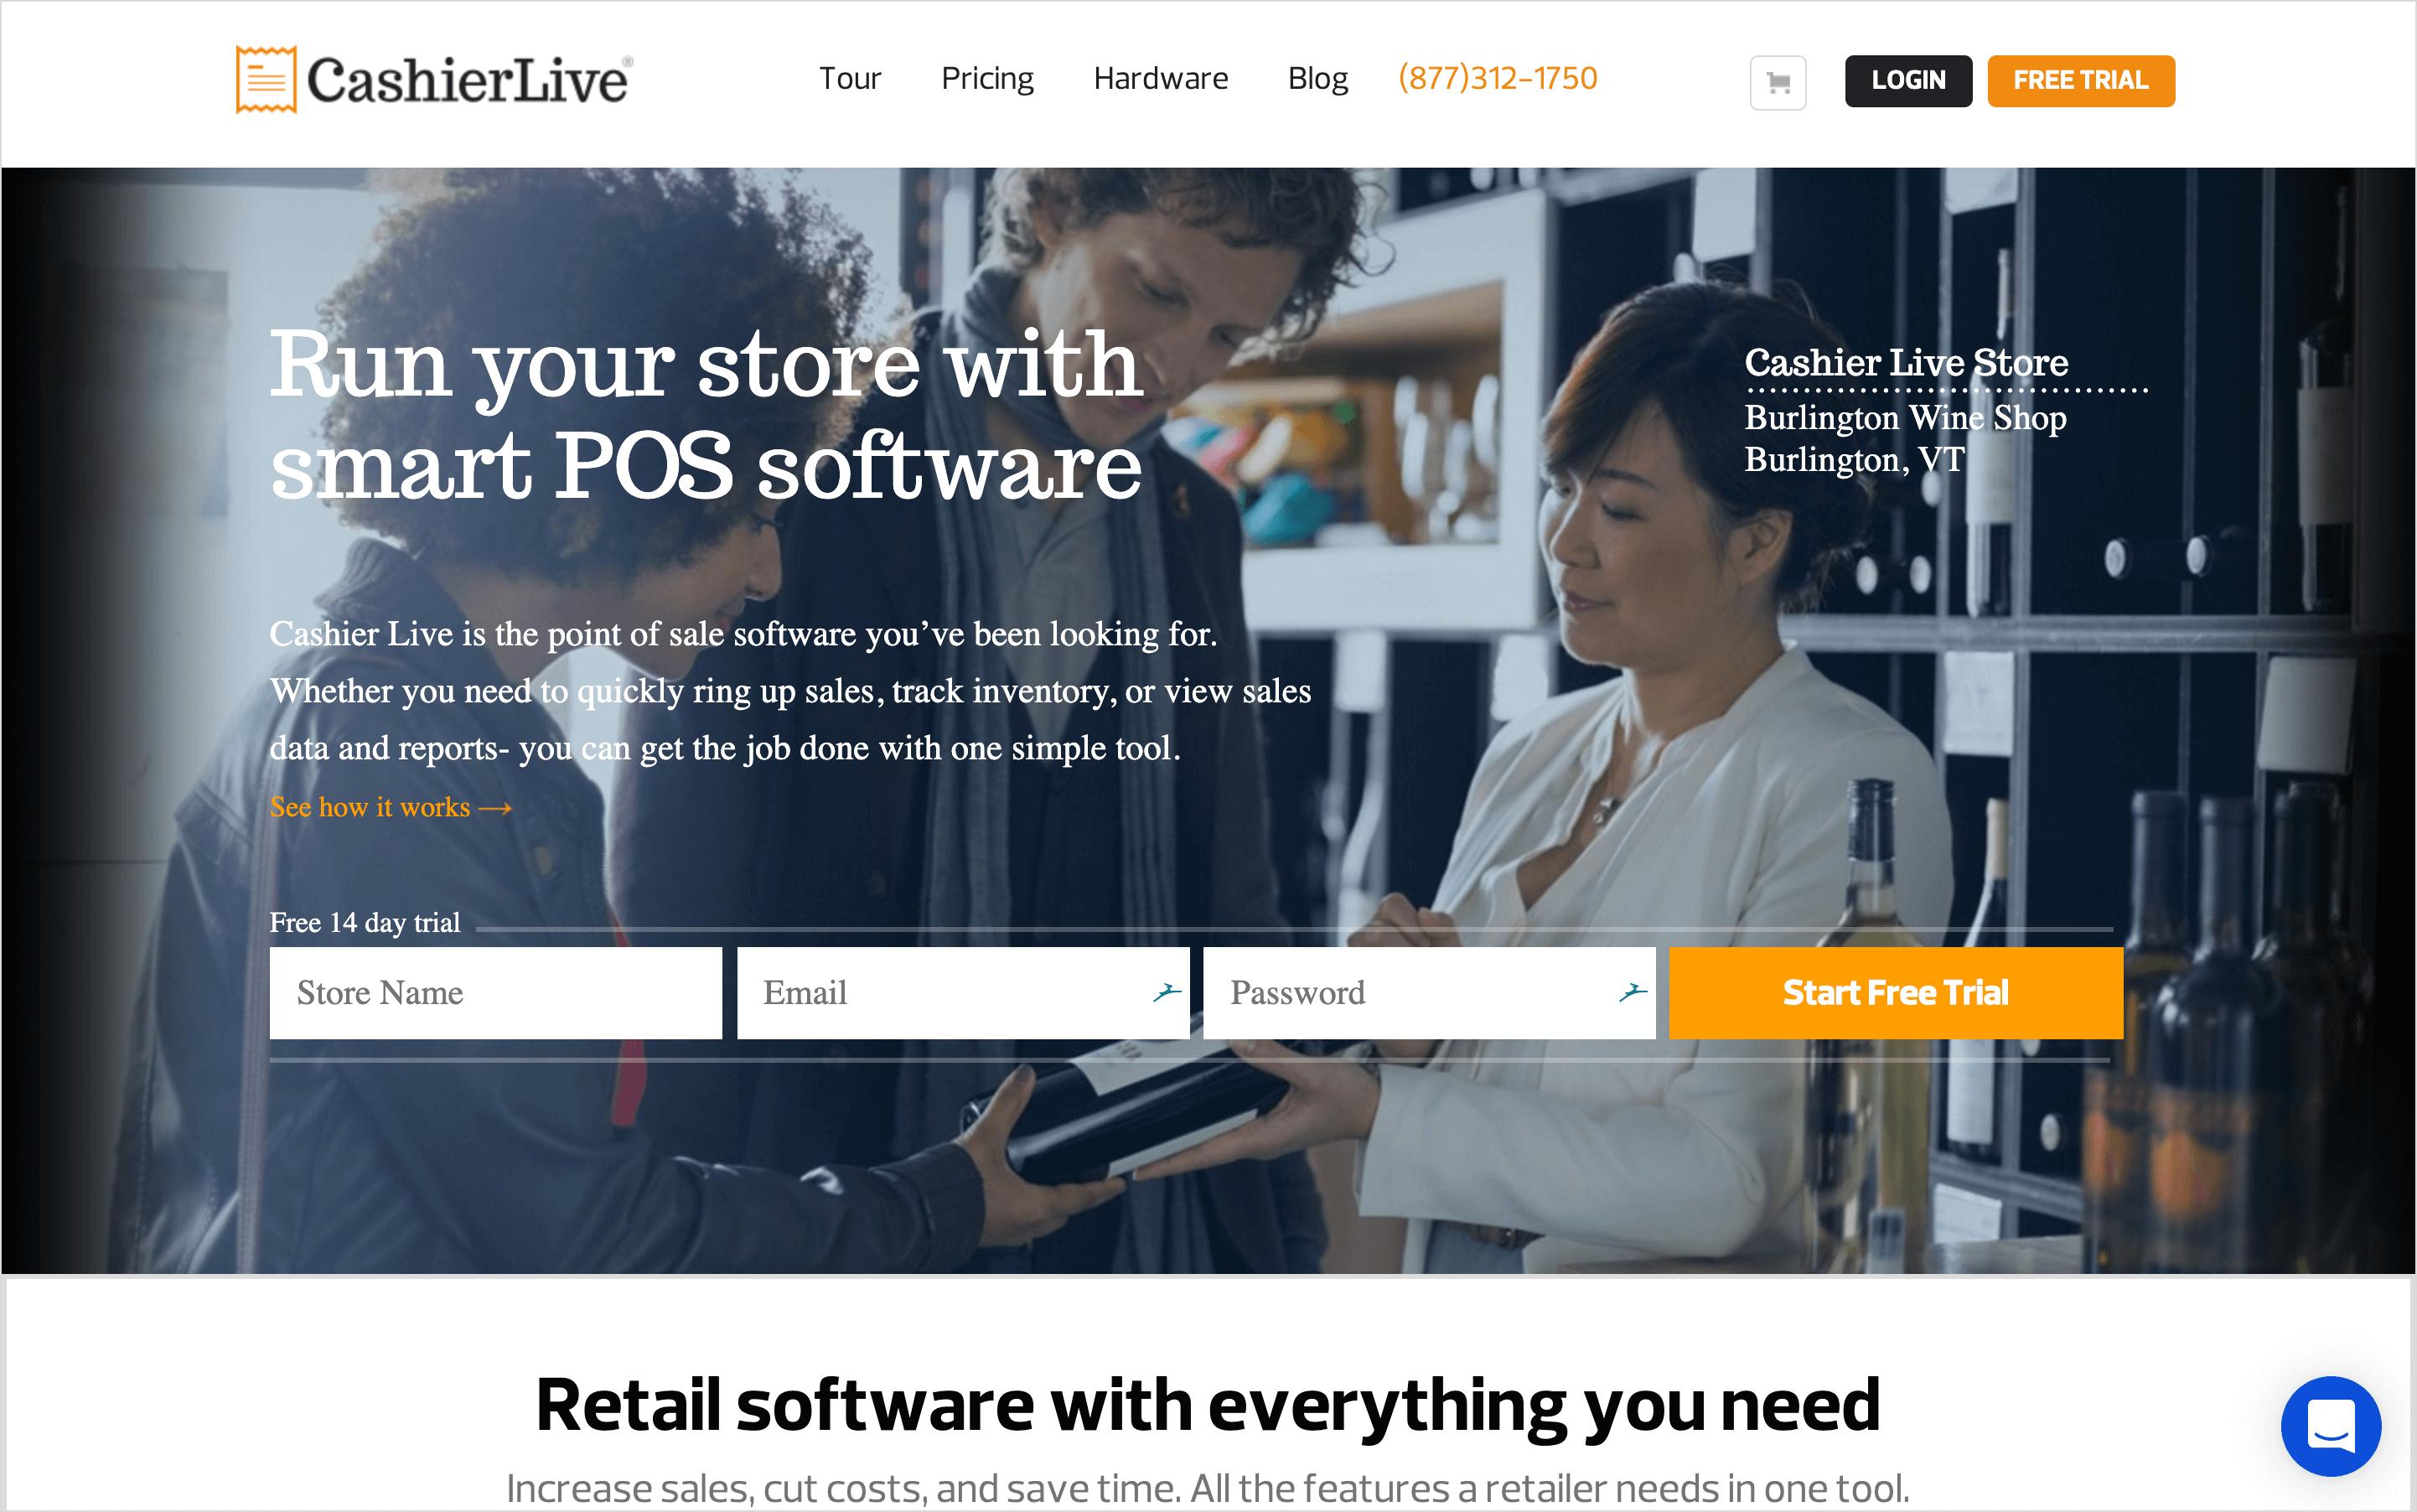 cashierlive homepage